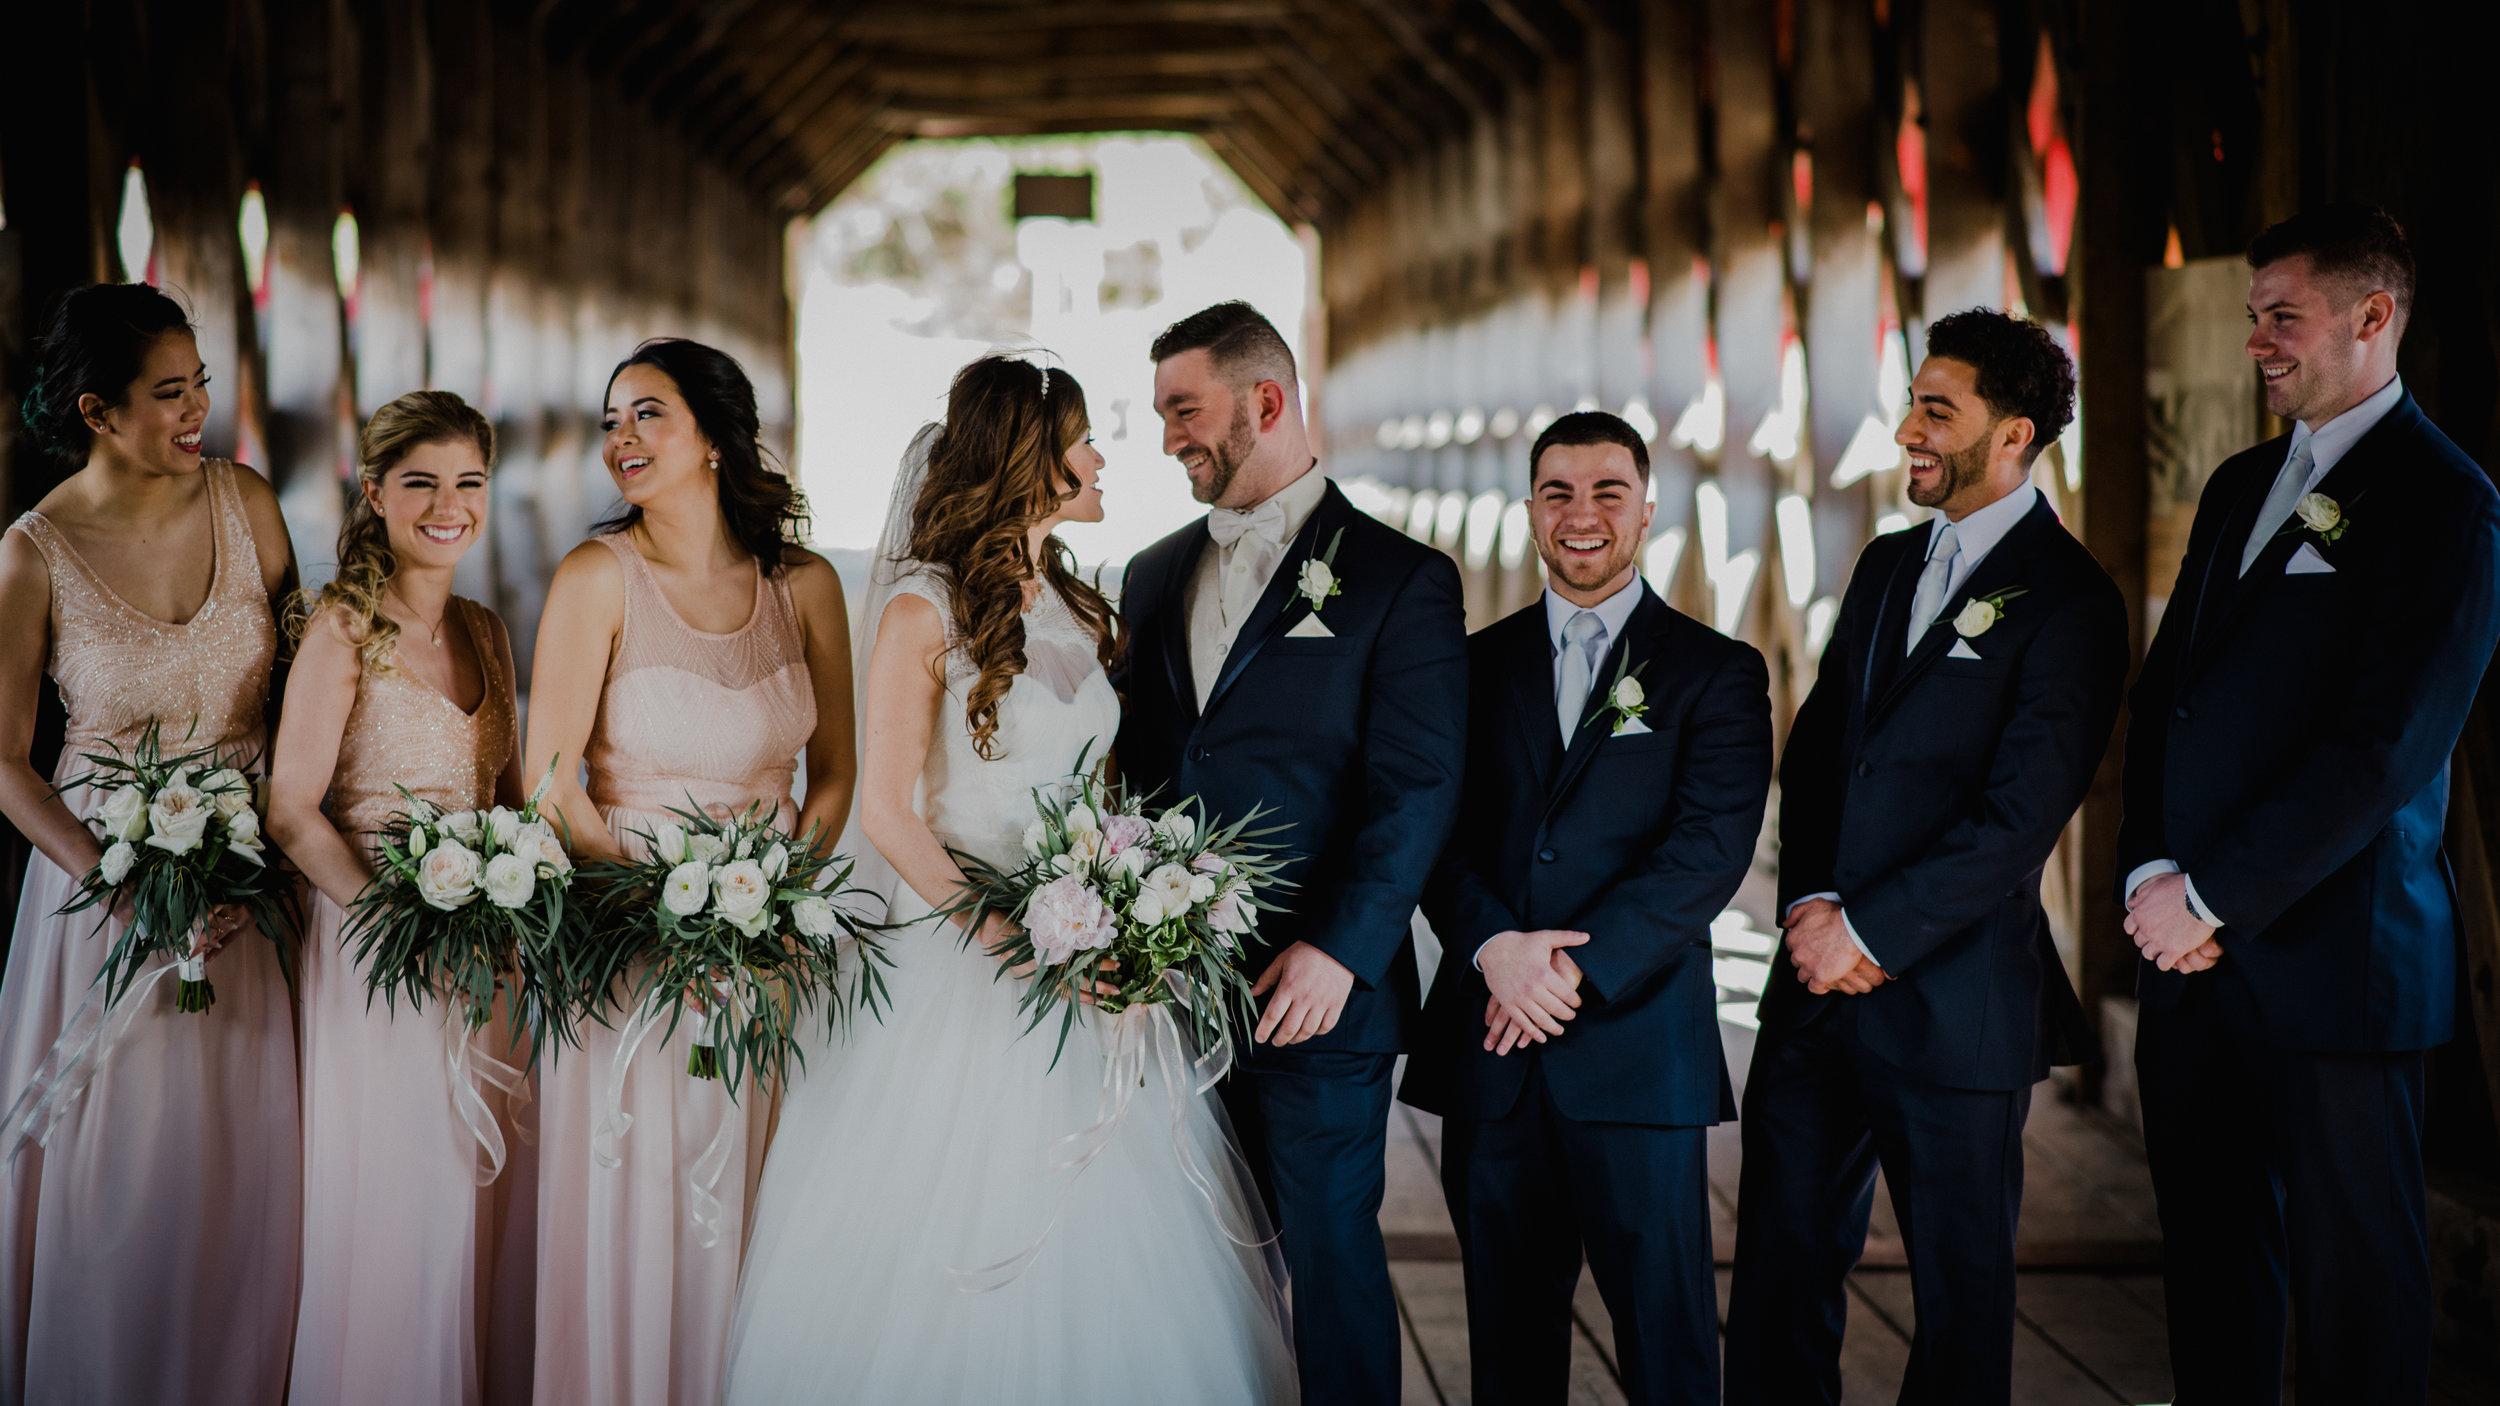 Le Belvedere, Wakefield Wedding - Wedding Party 1